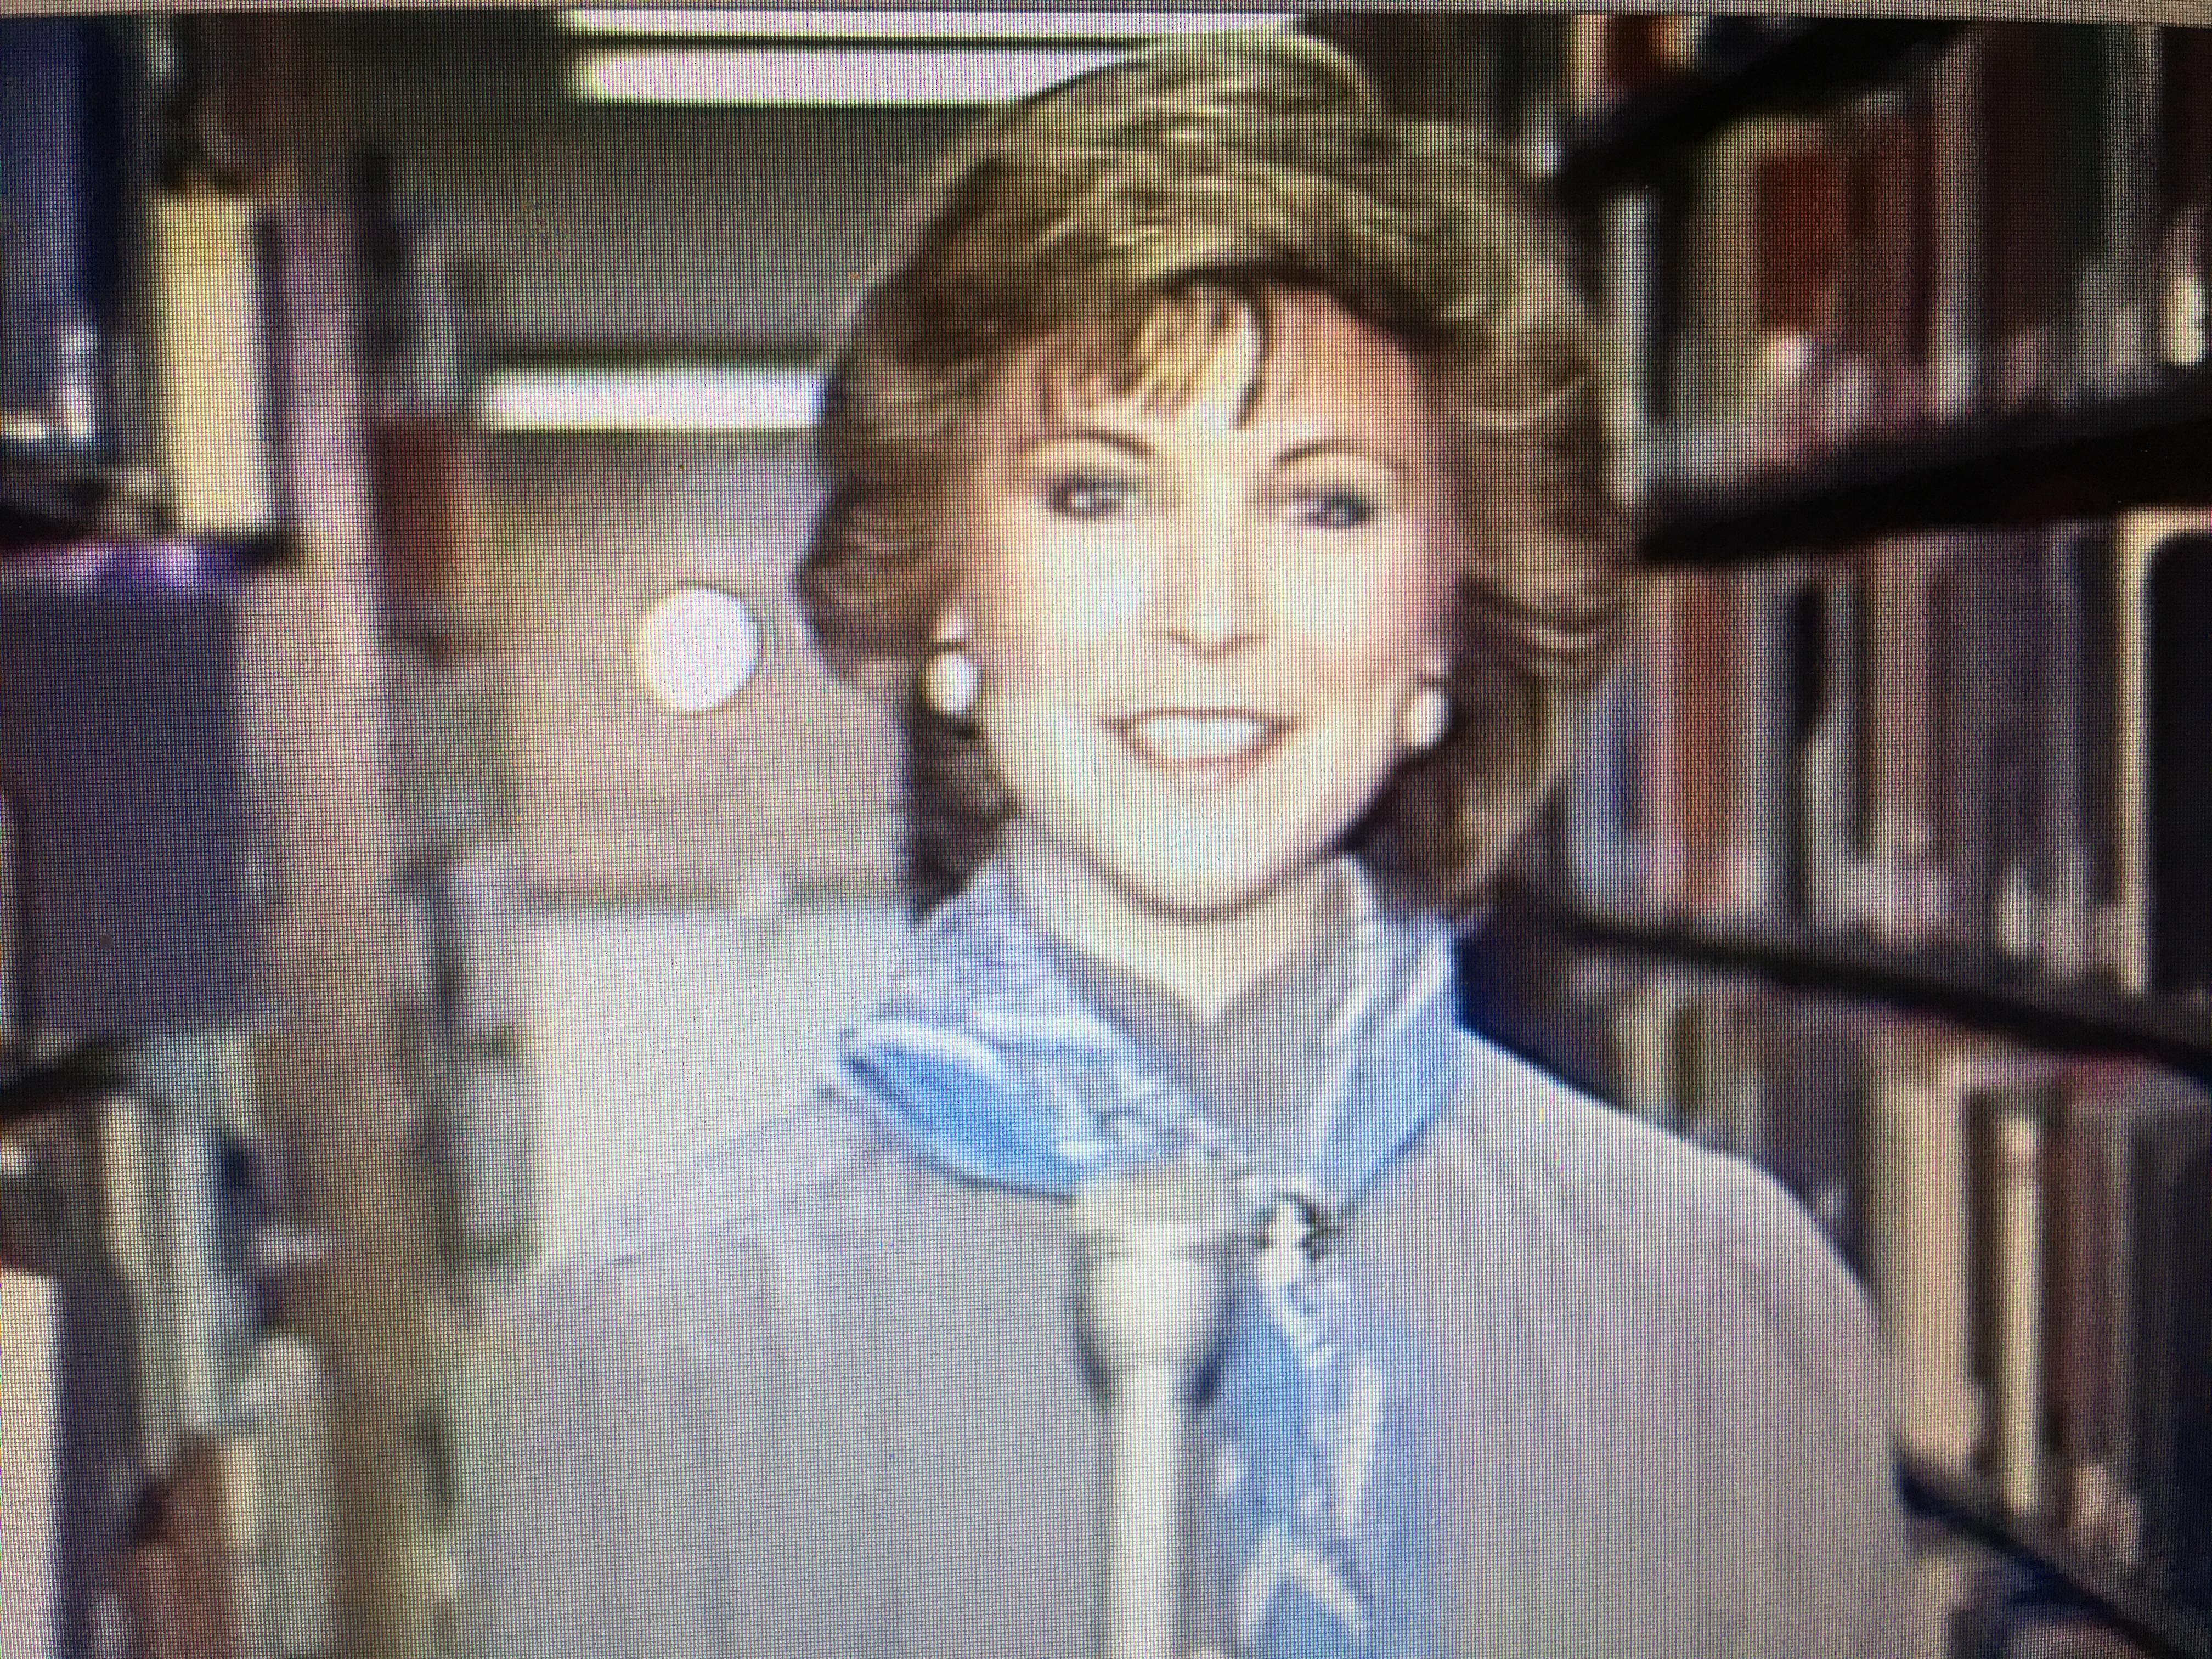 1986 - WEYI FLINT, MI